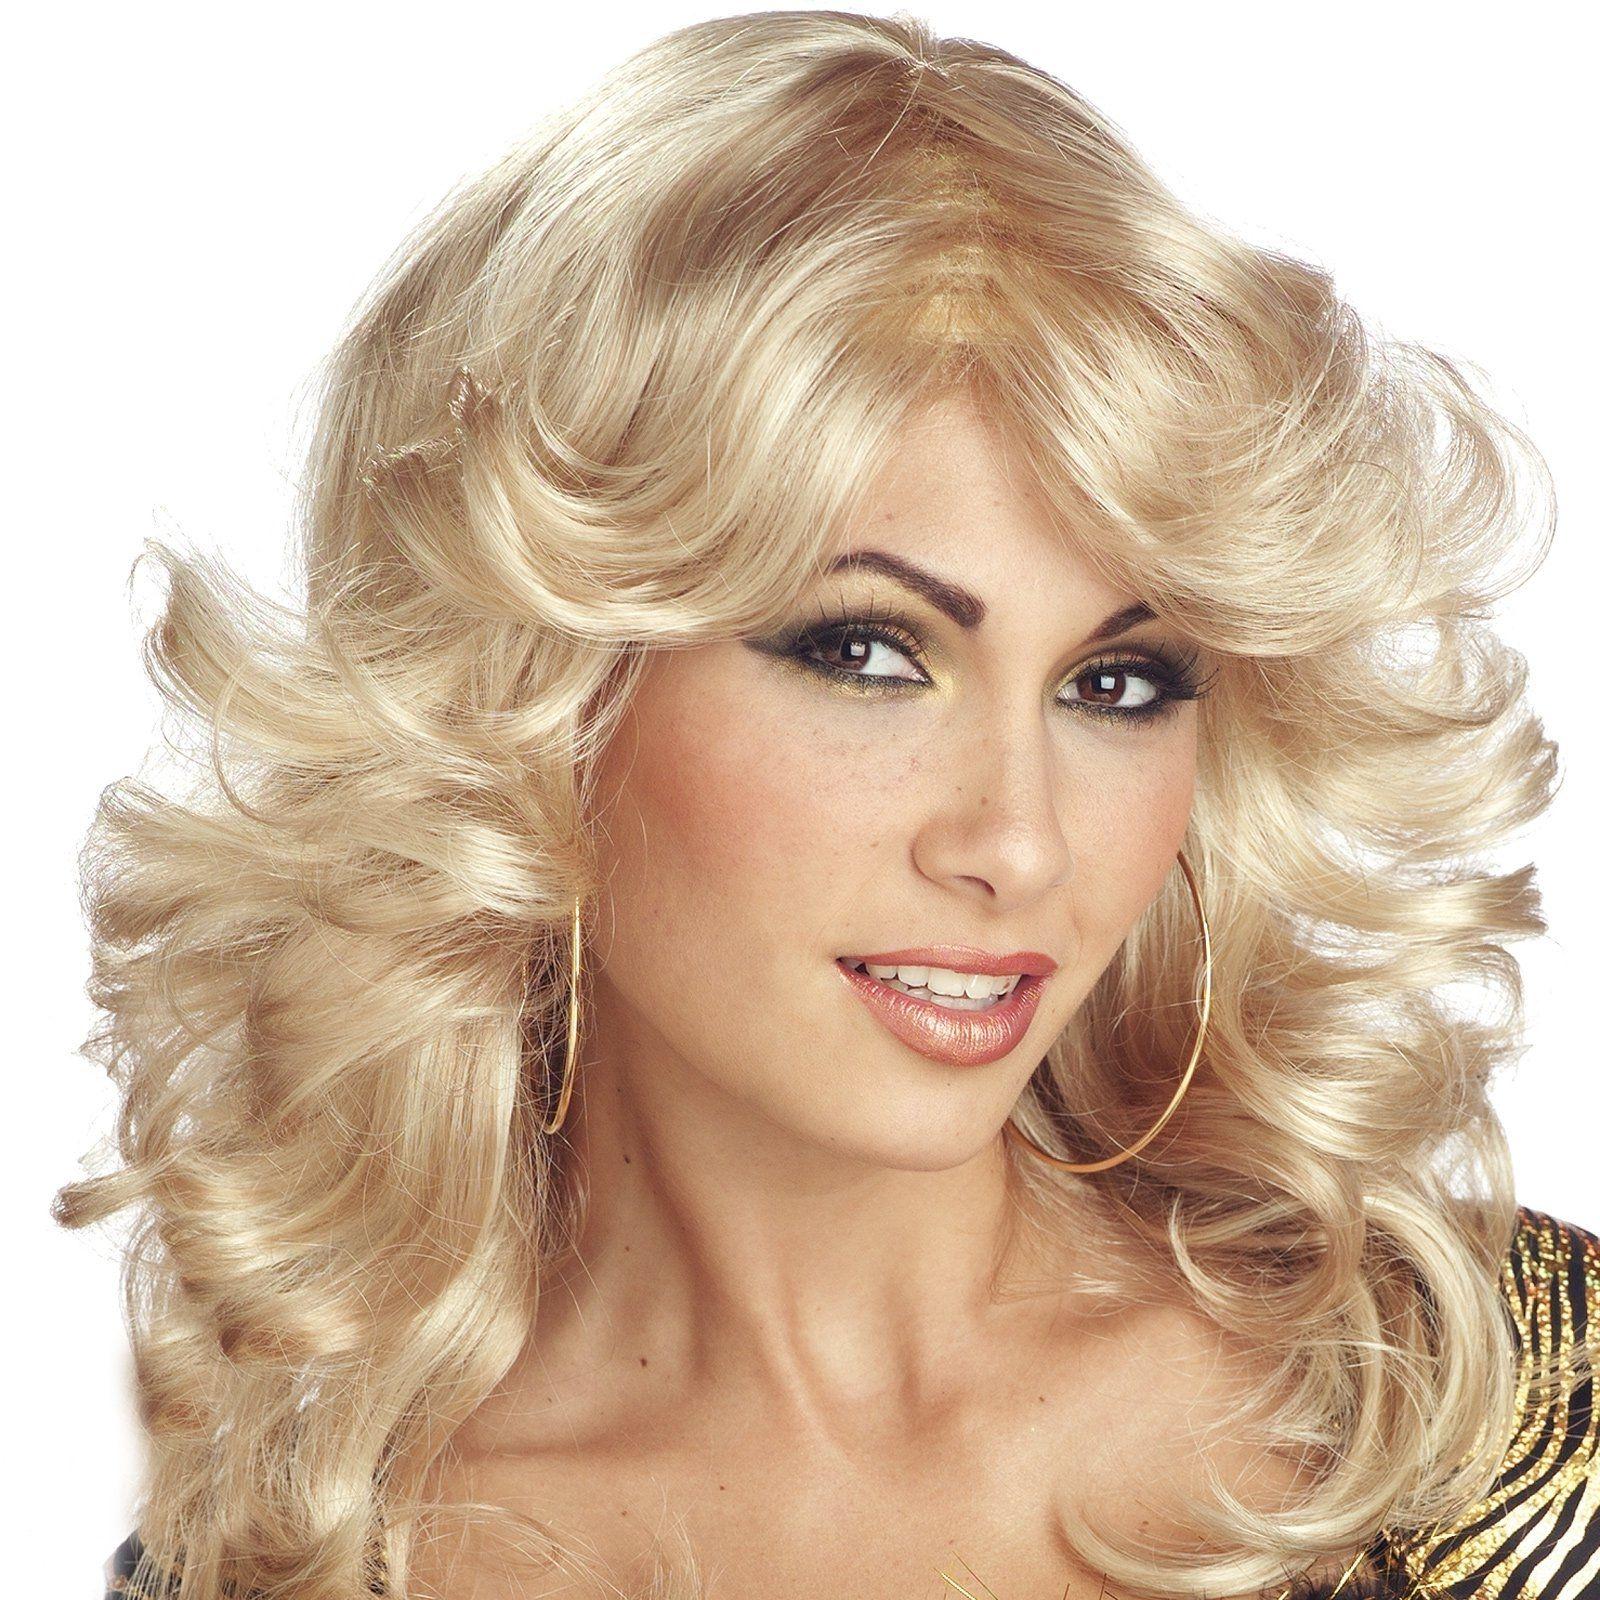 Hair Styles Blog Hair Styles For Disco Disco Hair 70s Makeup Disco Makeup